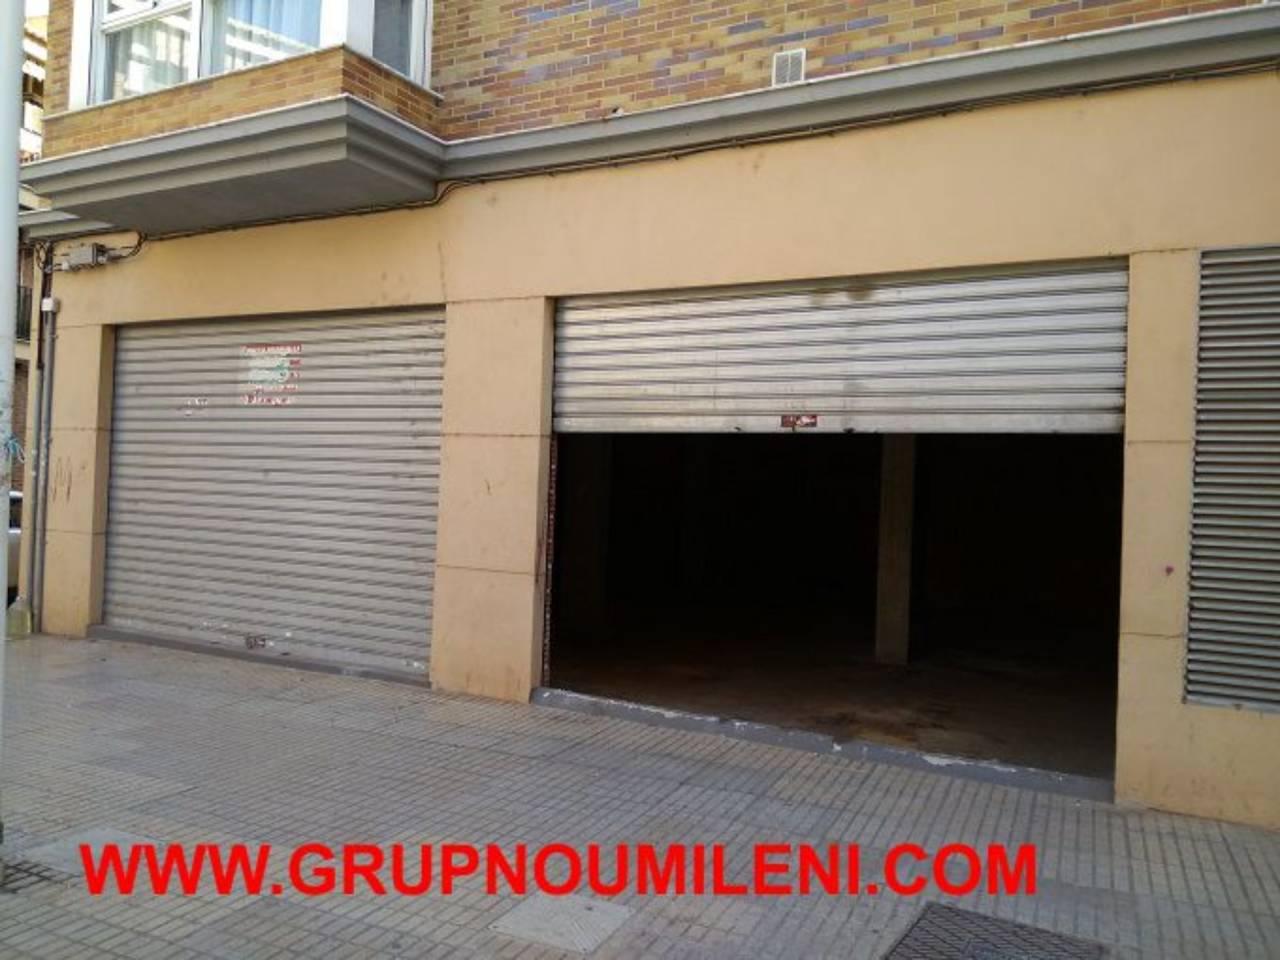 Geschäftsraum  Calle florida. Superficie total 115 m², local superficie útil 106 m², estado co